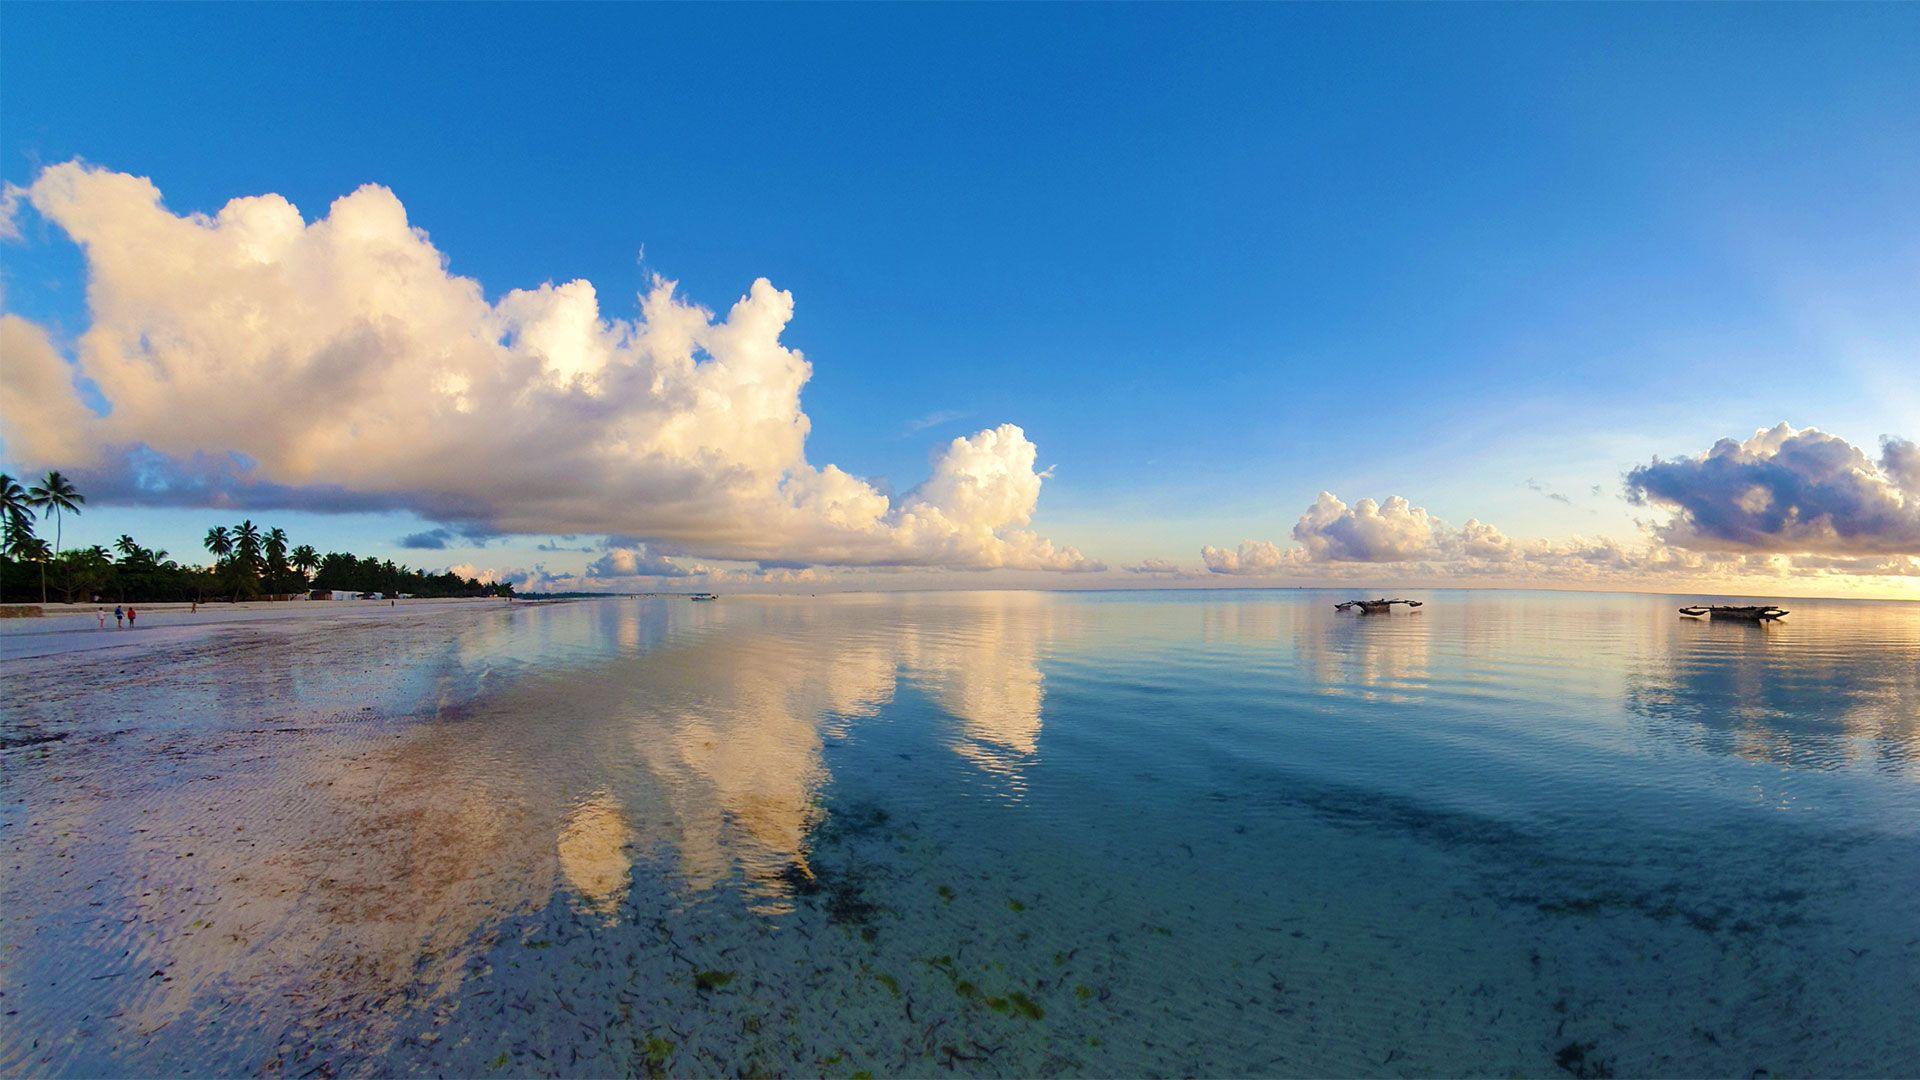 Sejur plaja Zanzibar, Tanzania - 8 Octombrie 2021